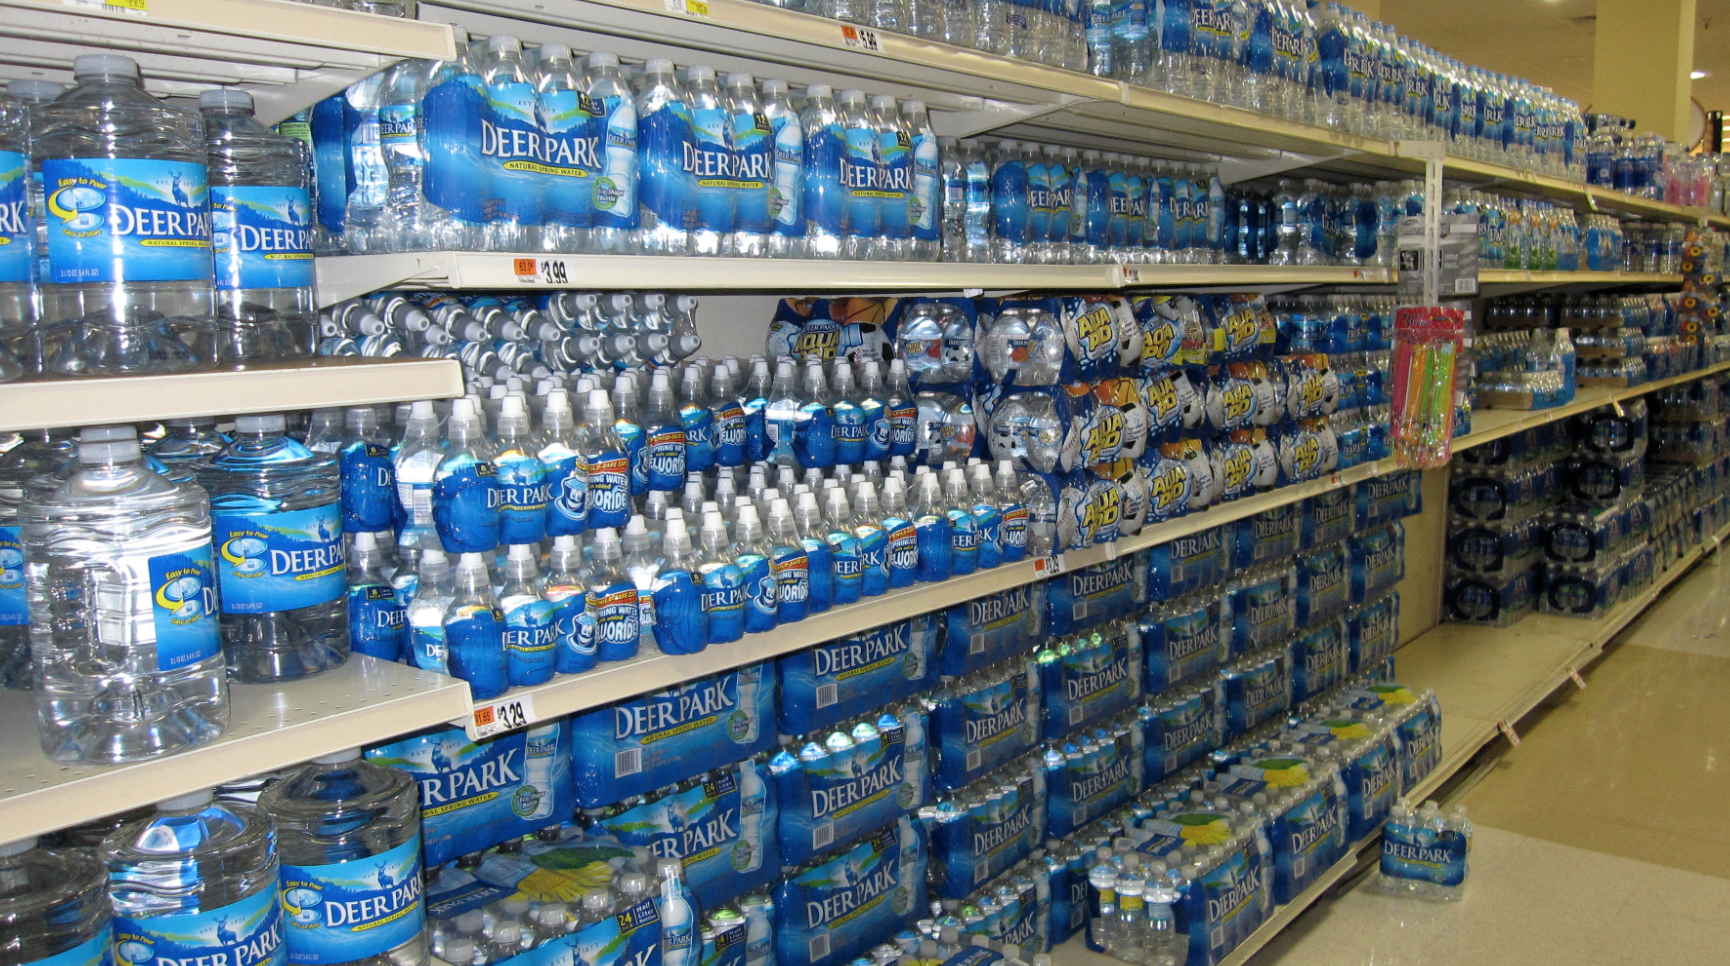 Prepare For Hurricane Irma Stock Up On Supplies Photo: Ivy Main, WikiCommons, No Change